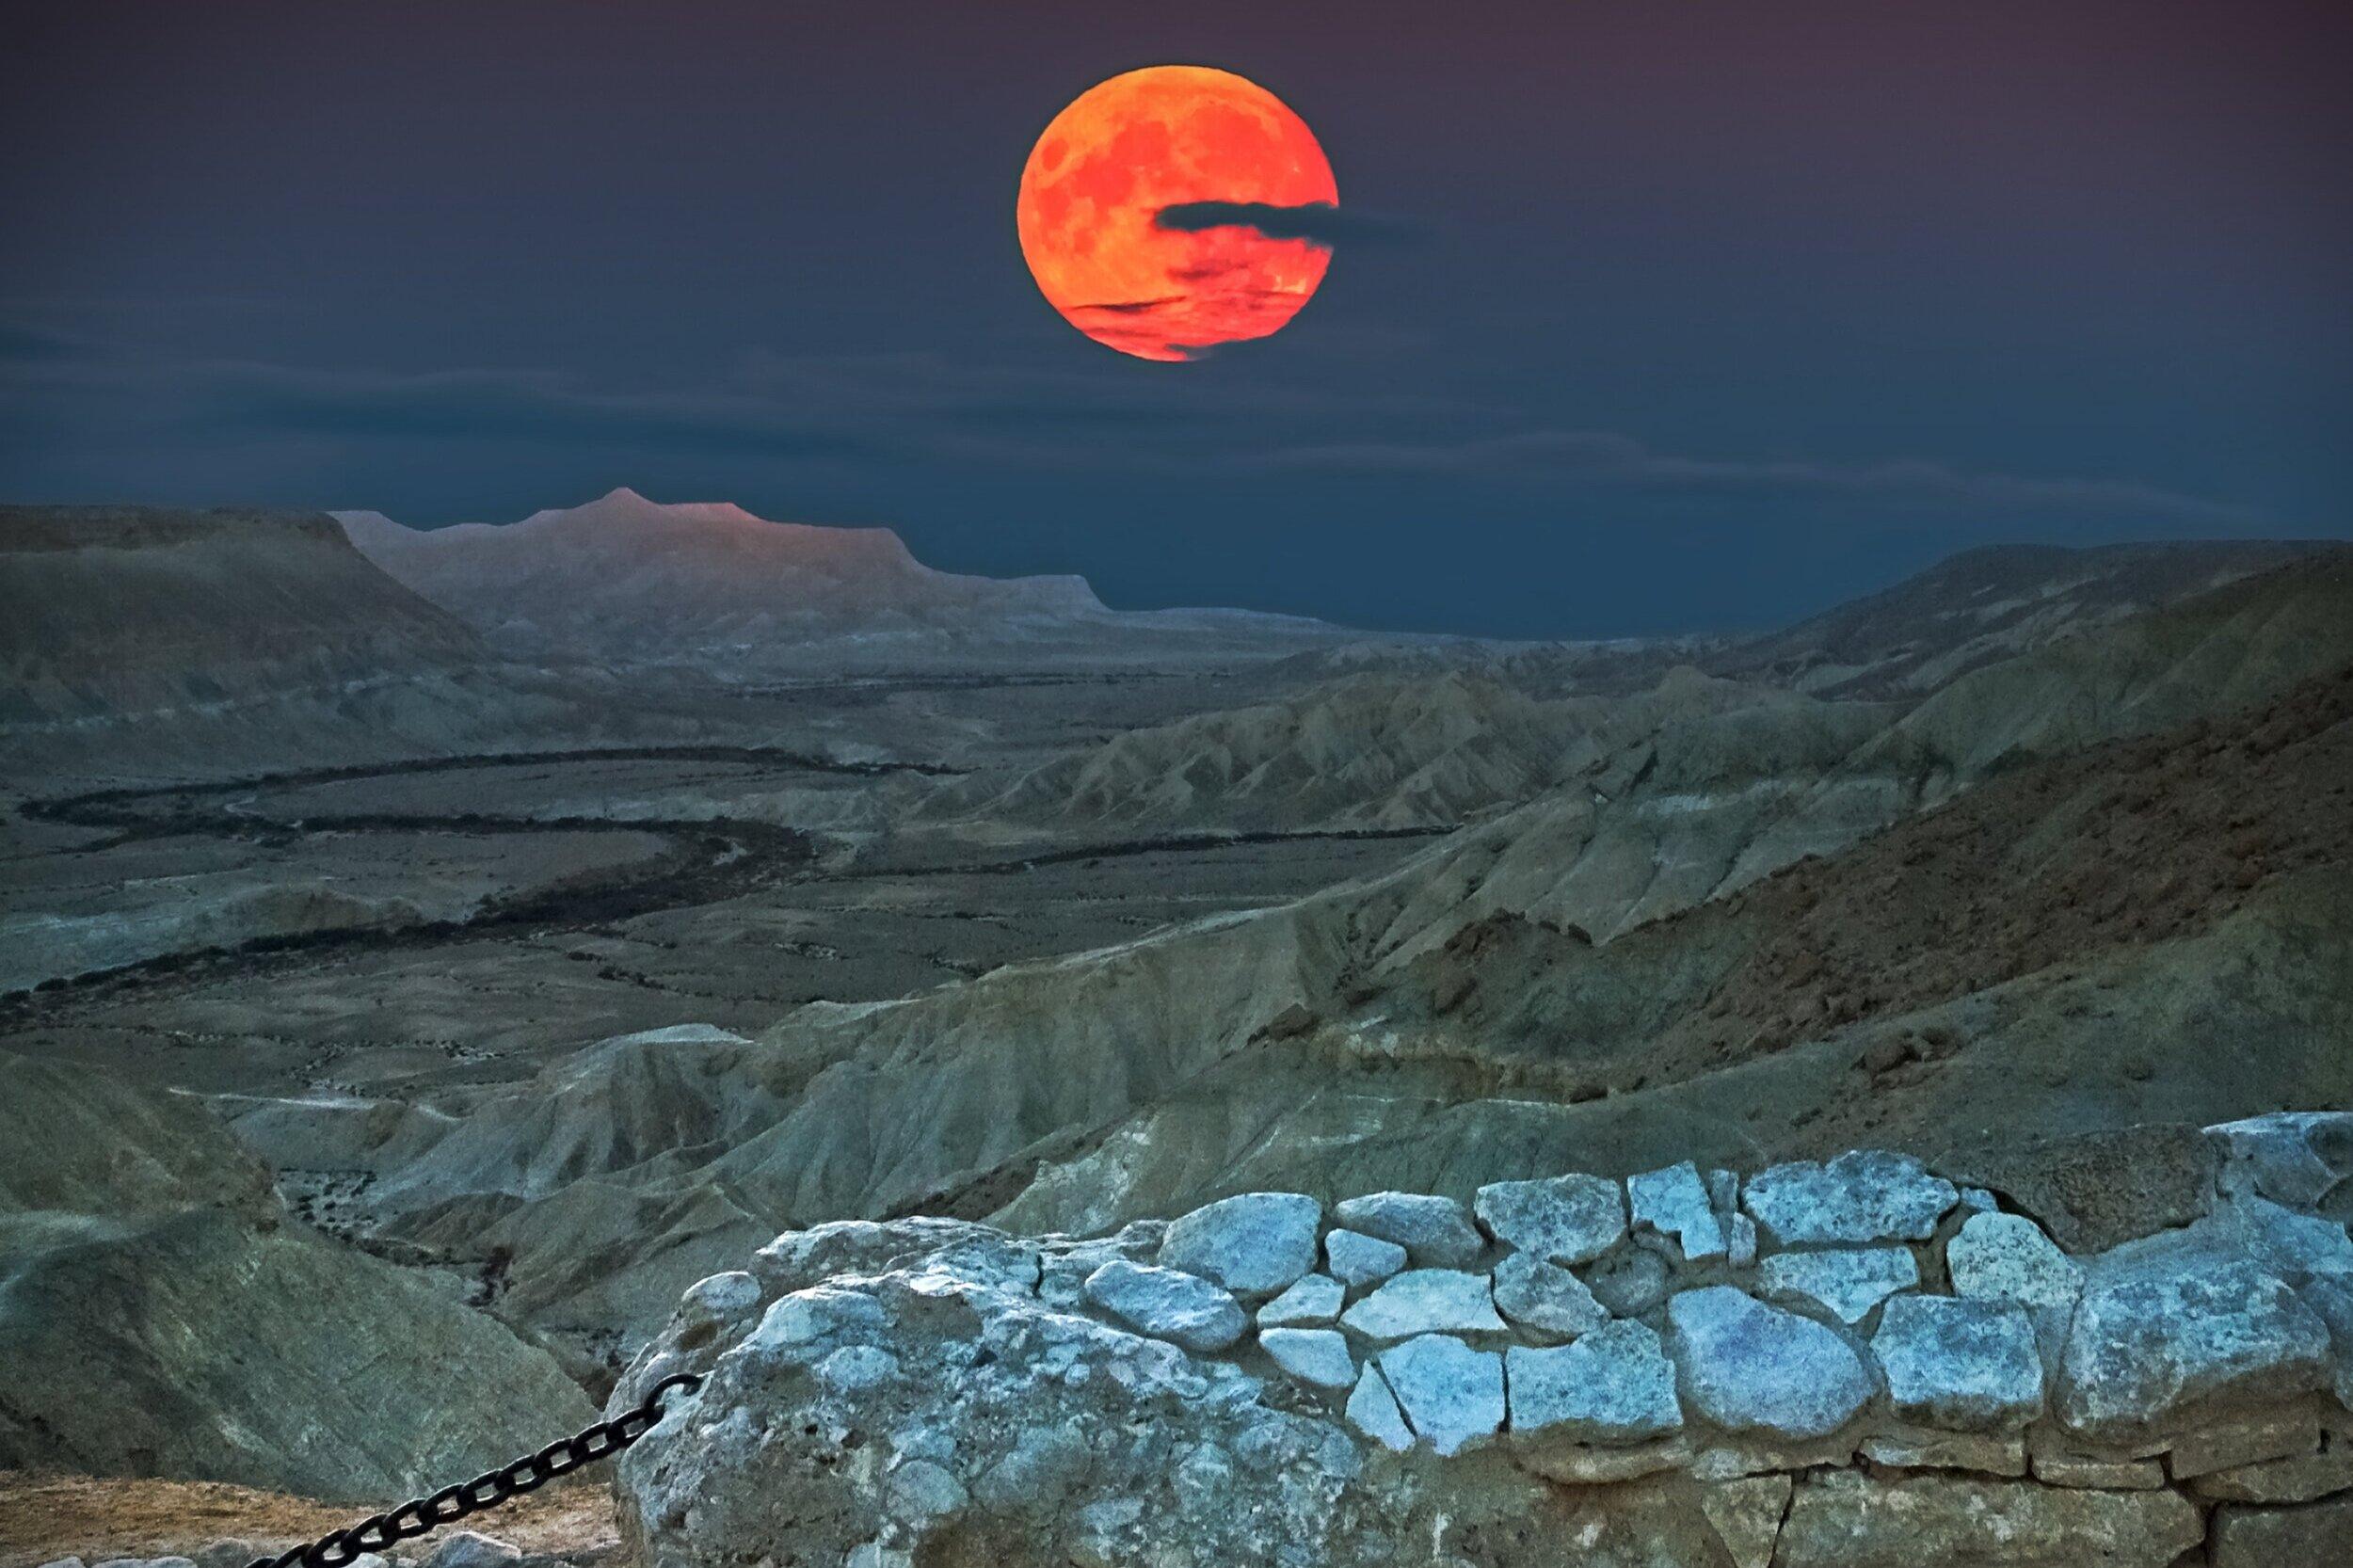 Negev Desert, Israel - March 21 - 27th, 2020